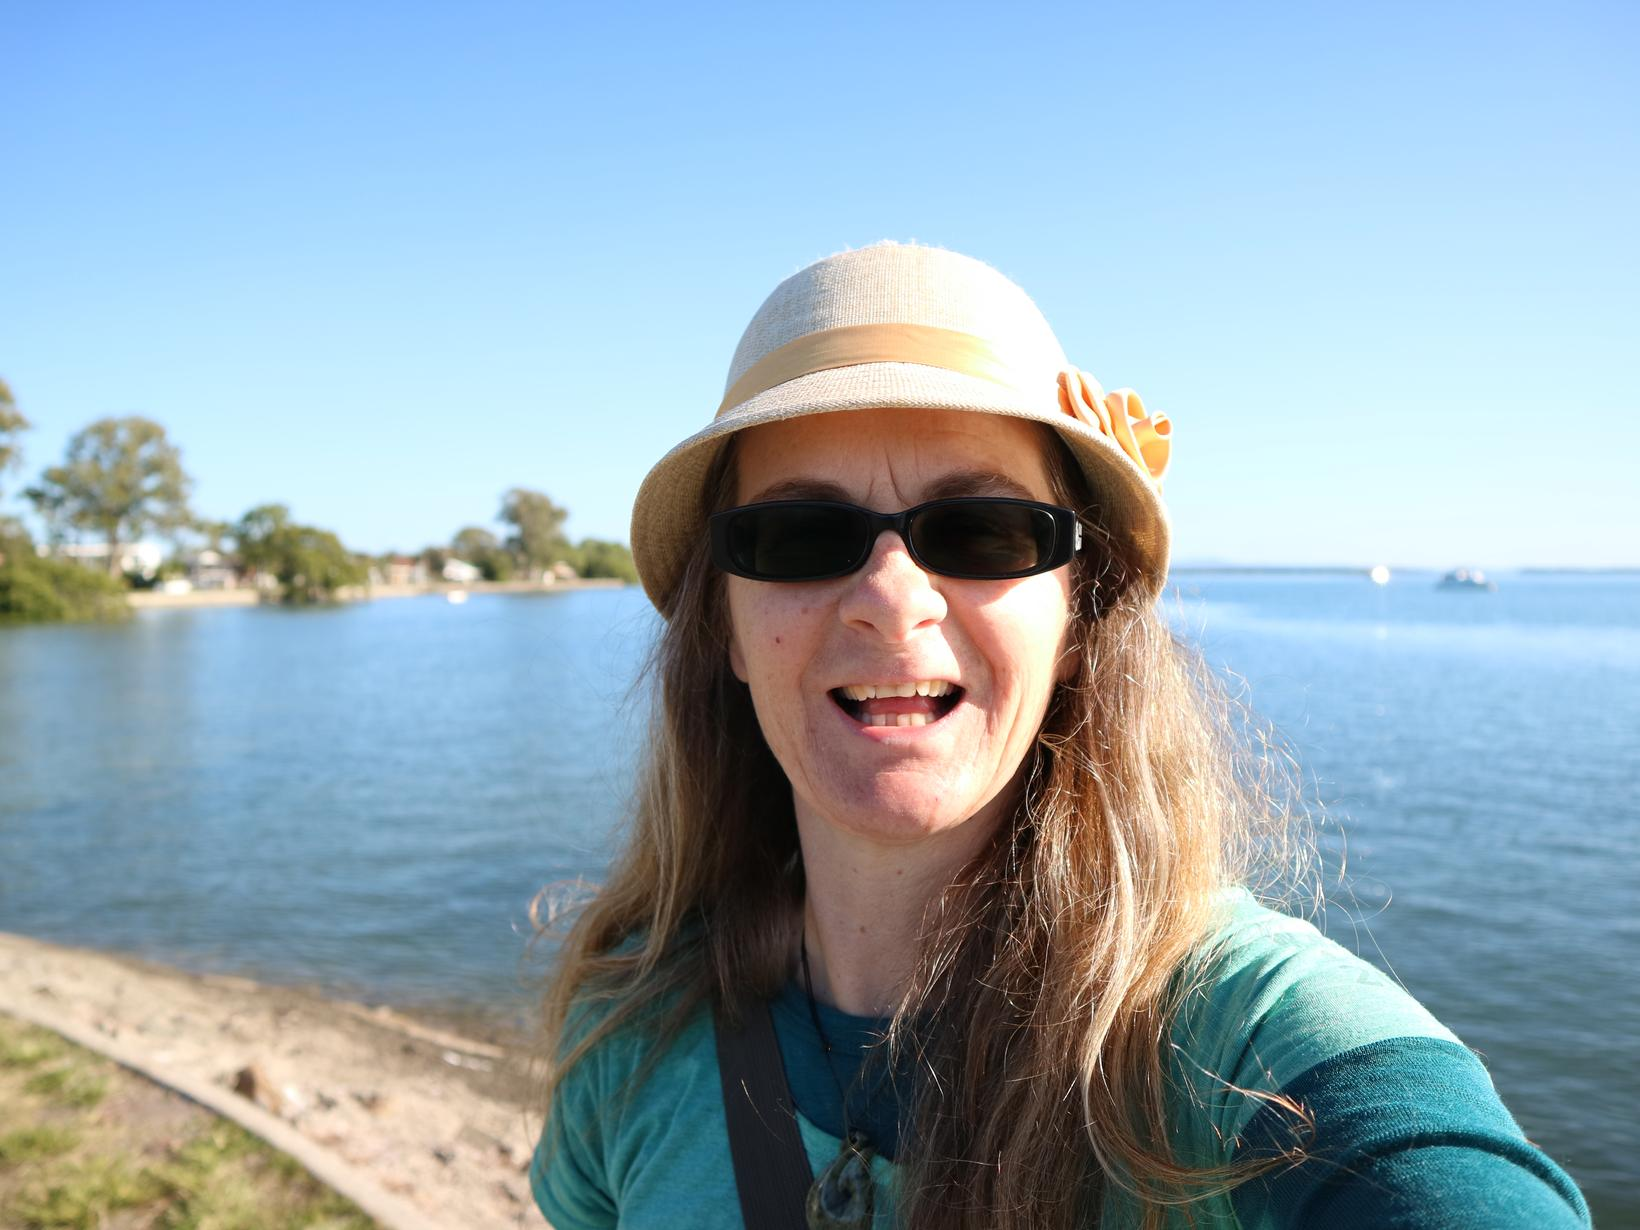 Karolyn from Tauranga, New Zealand